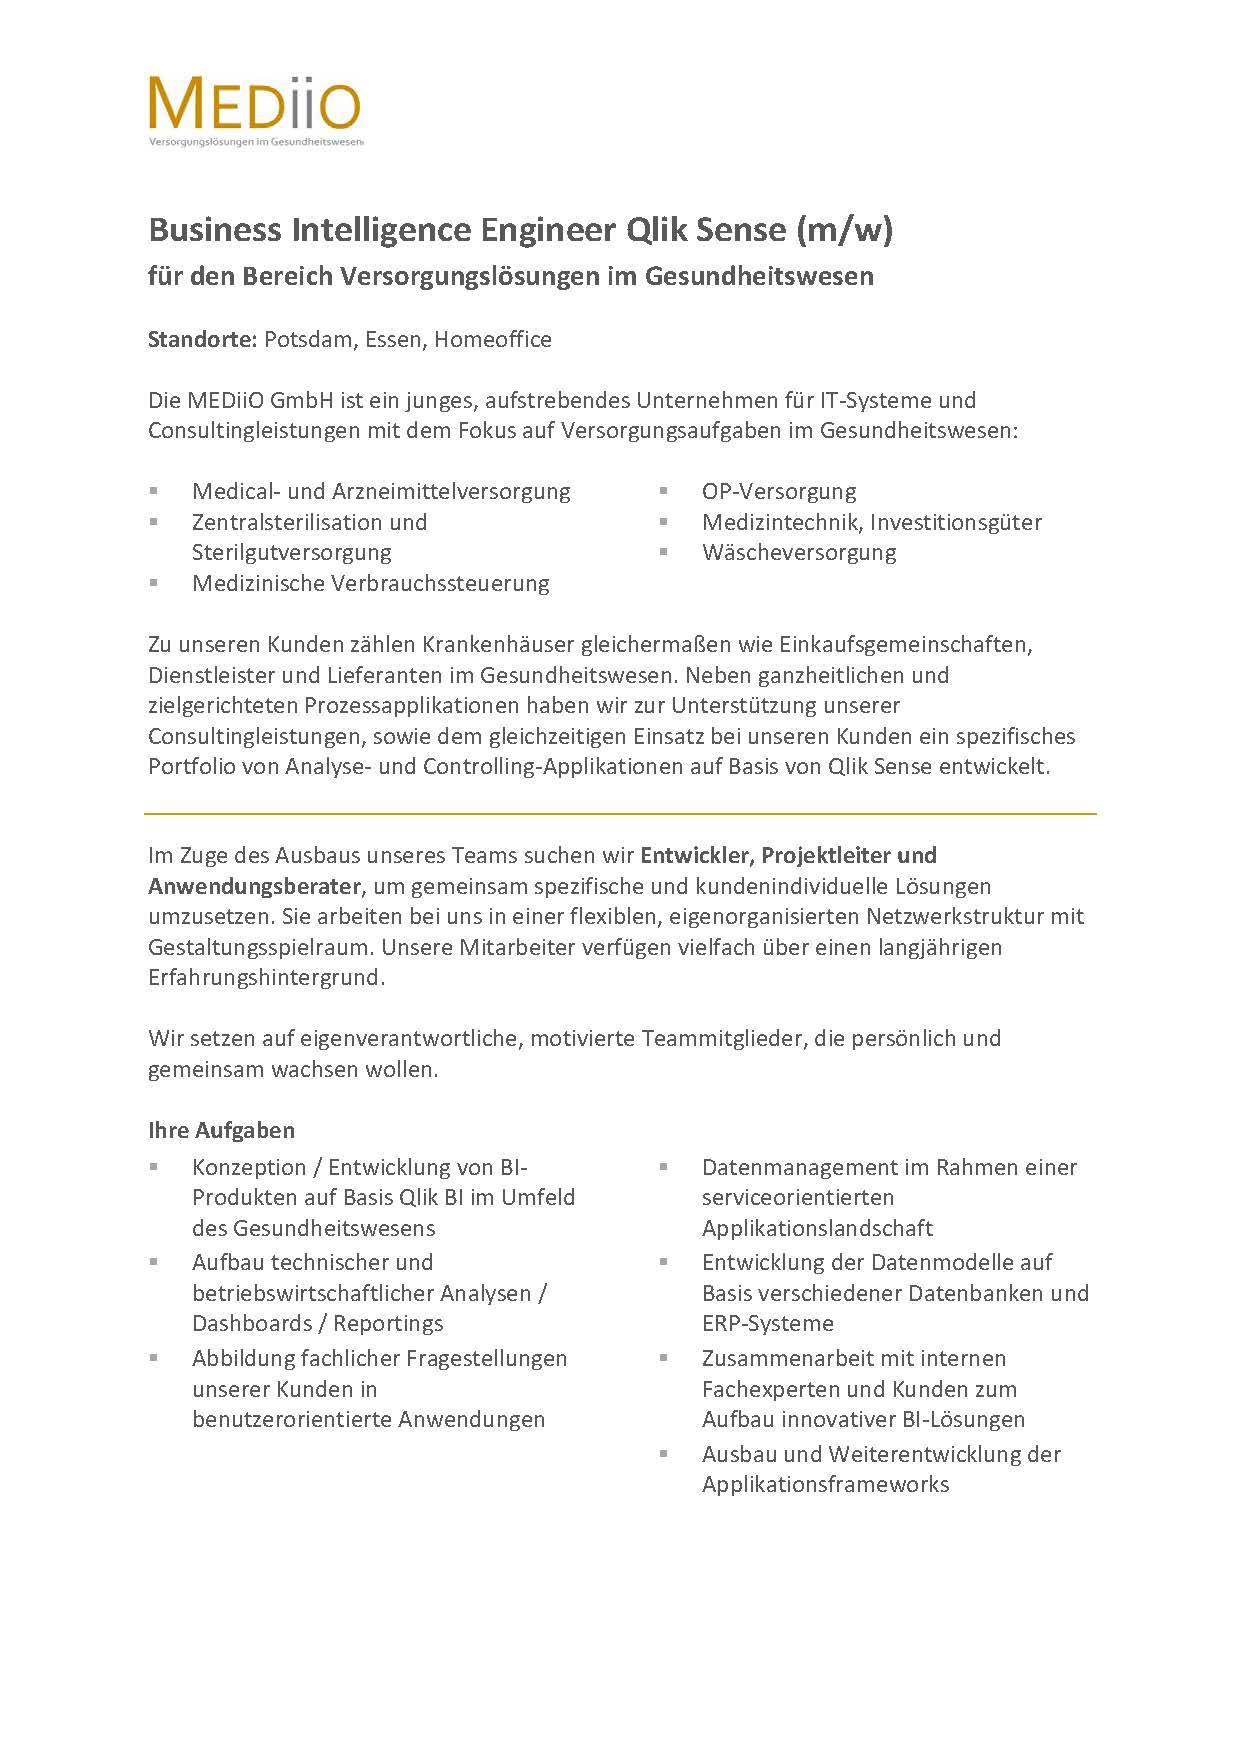 Business Intelligence Engineer Qlik Sense (m/w): MEDiiO GmbH, Potsdam /  Essen - myDRG - Forum Medizincontrolling, Kodierung & Krankenhausabrechnung